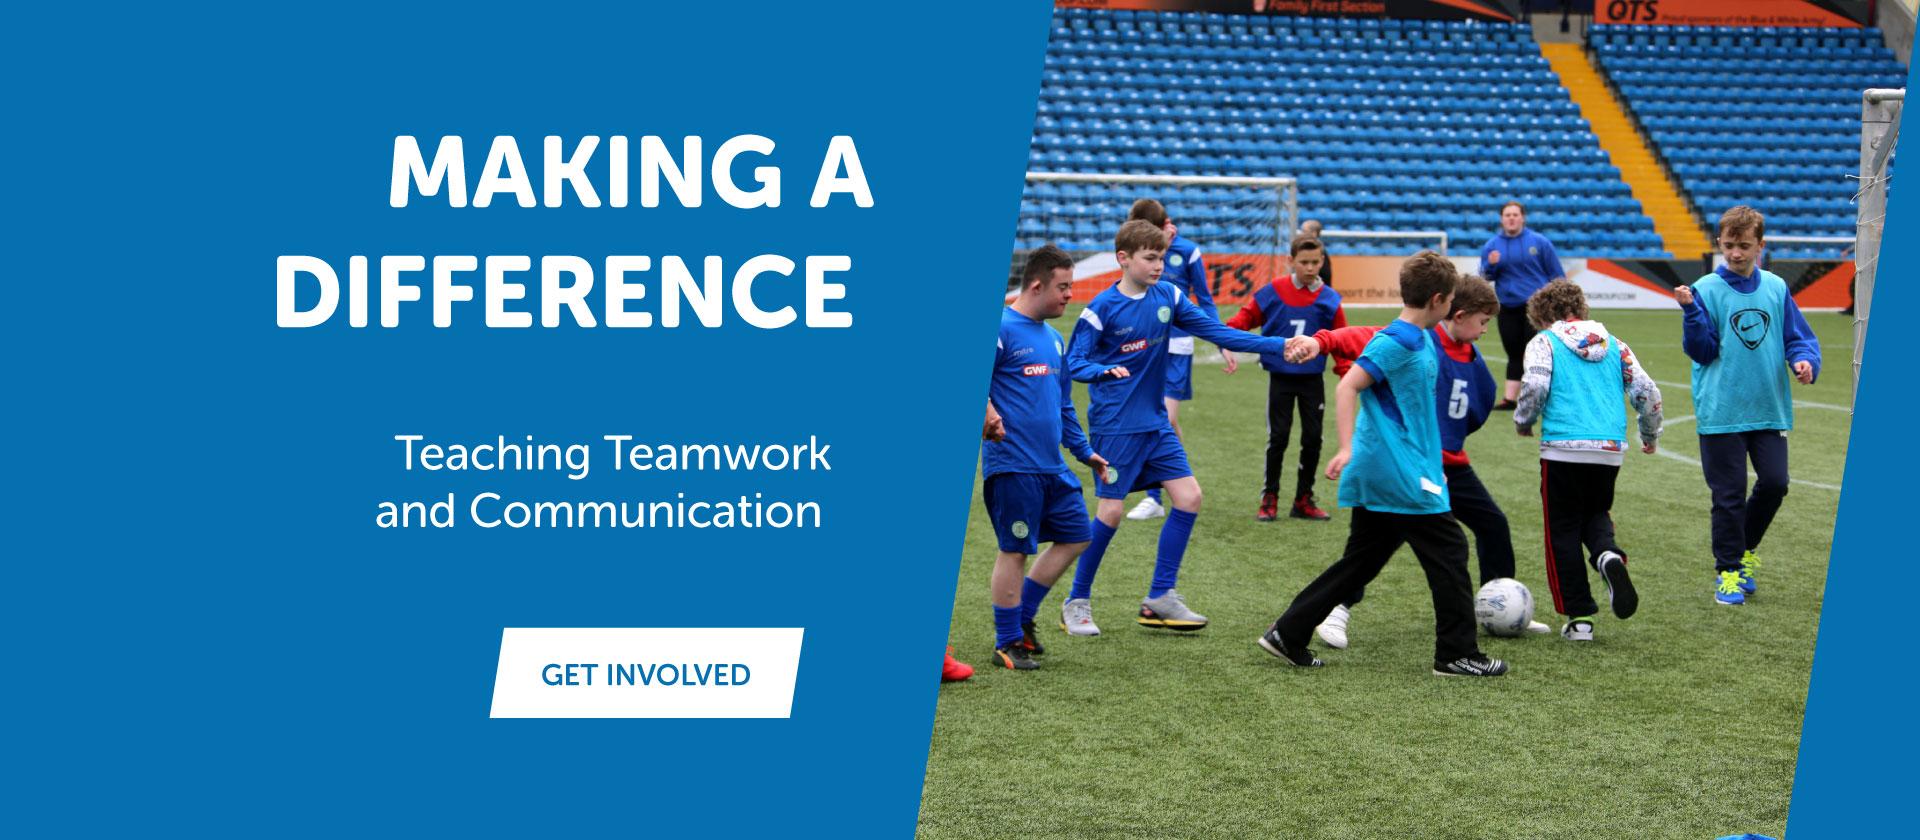 Teaching Teamwork and Communication